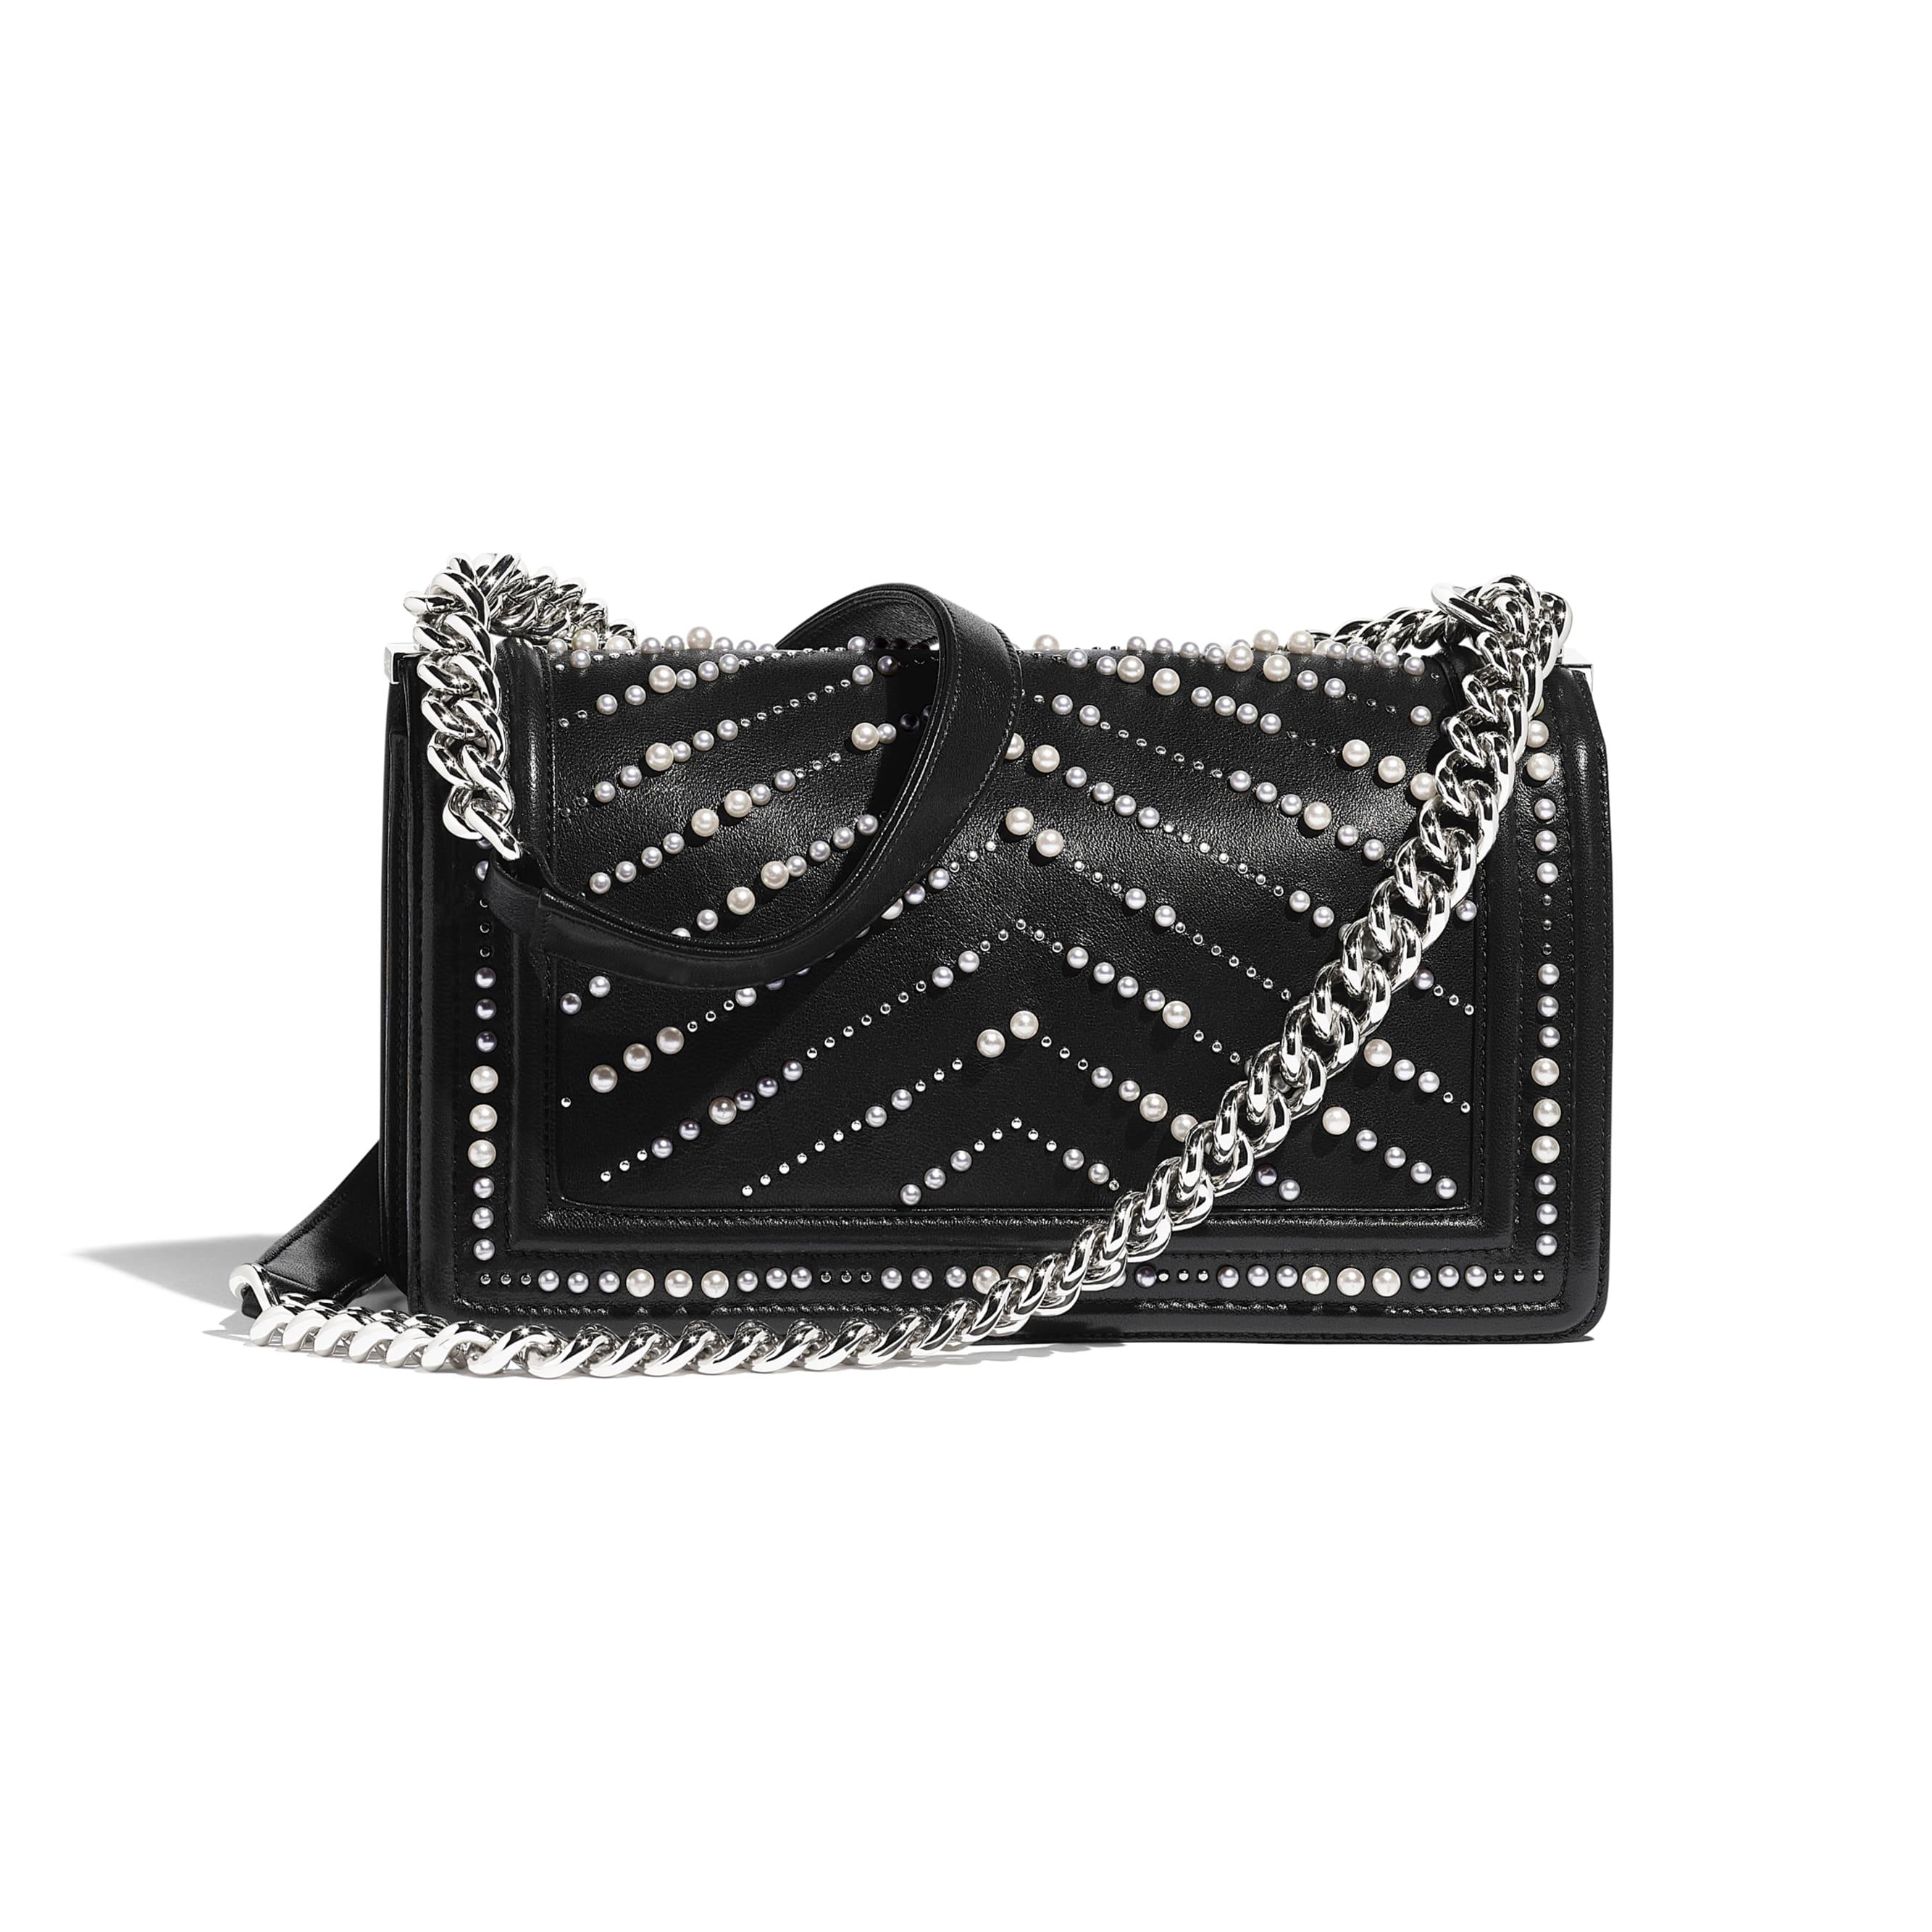 BOY CHANEL Handbag - Black - Calfskin, Imitation Pearls & Silver-Tone Metal - CHANEL - Alternative view - see standard sized version